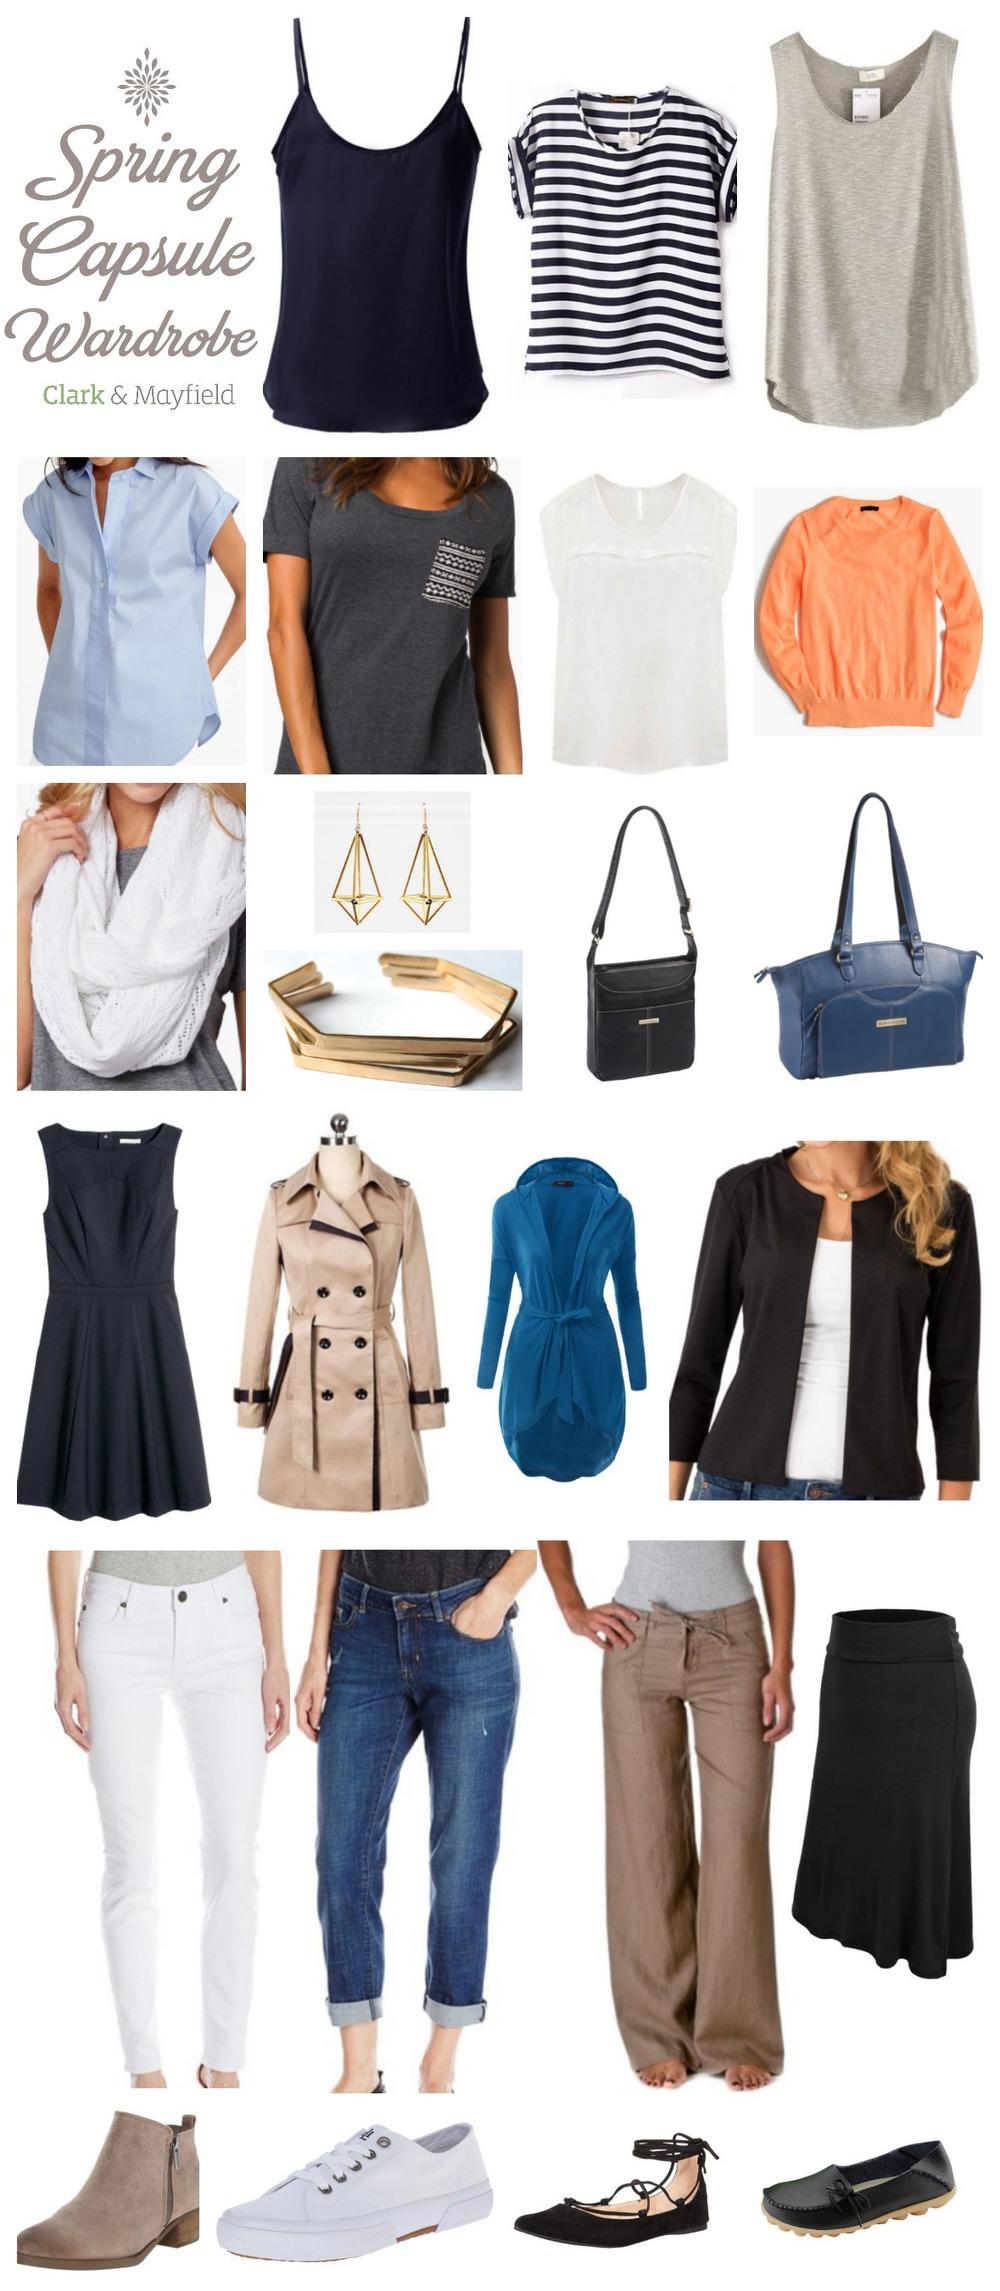 Spring Capsule Wardrobe C&M.jpg